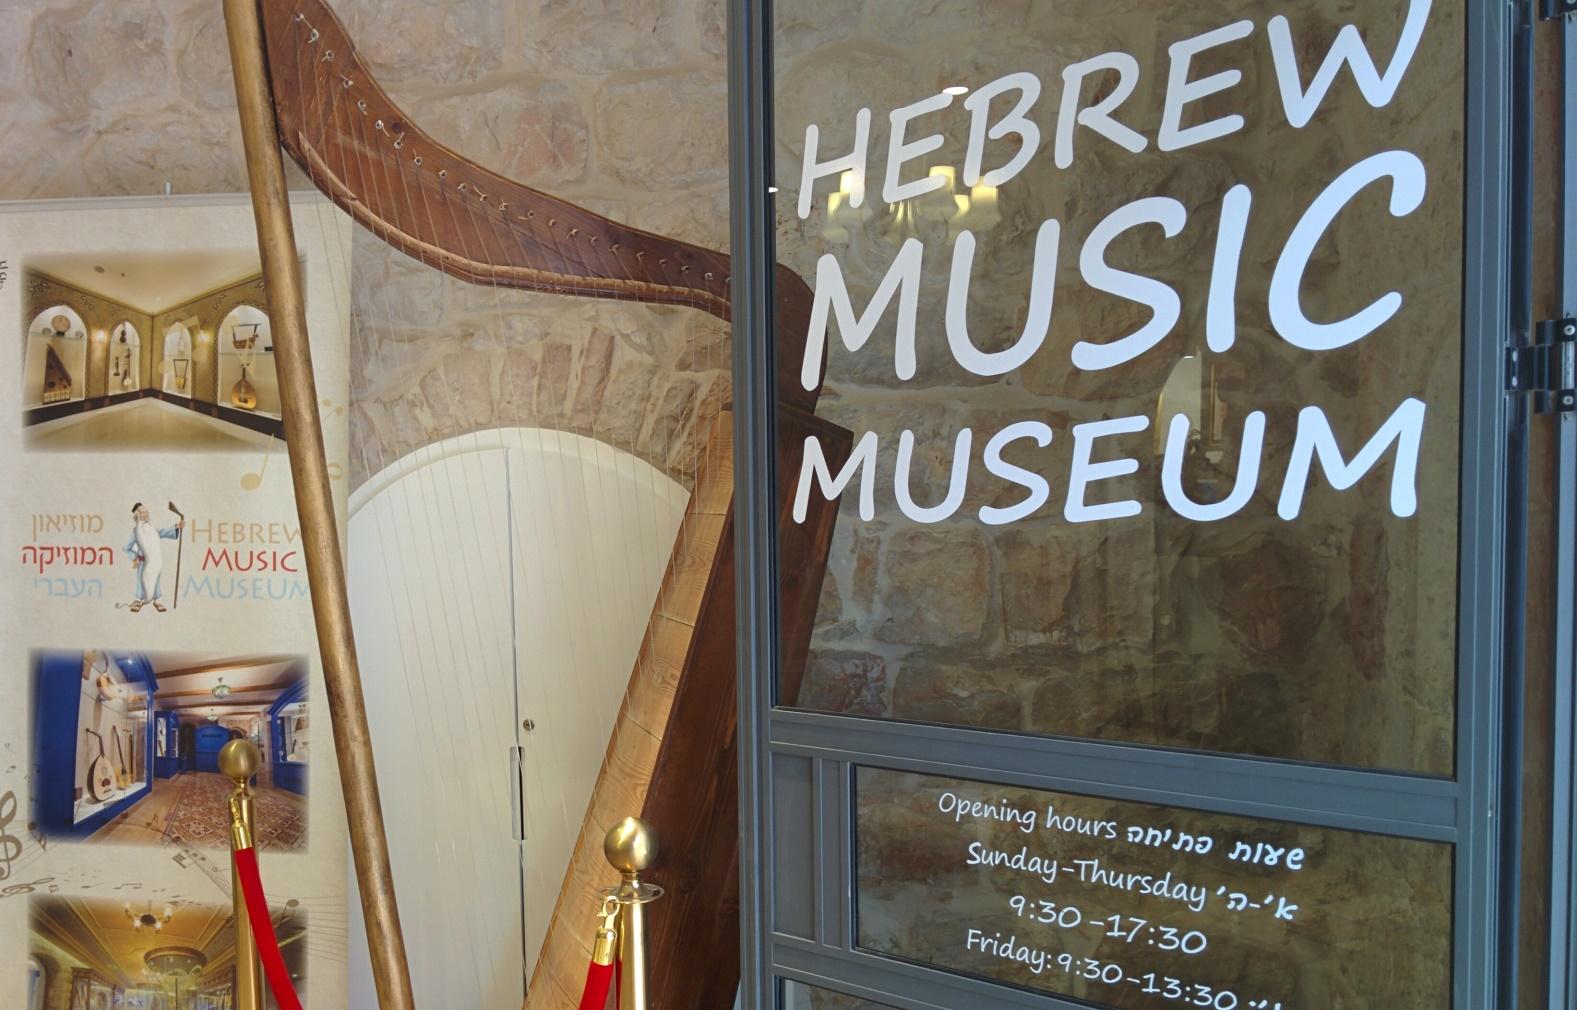 The Hebrew Music Museum in Kikar Hamusica in downtown Jerusalem. Photo by Abigail Klein Leichman